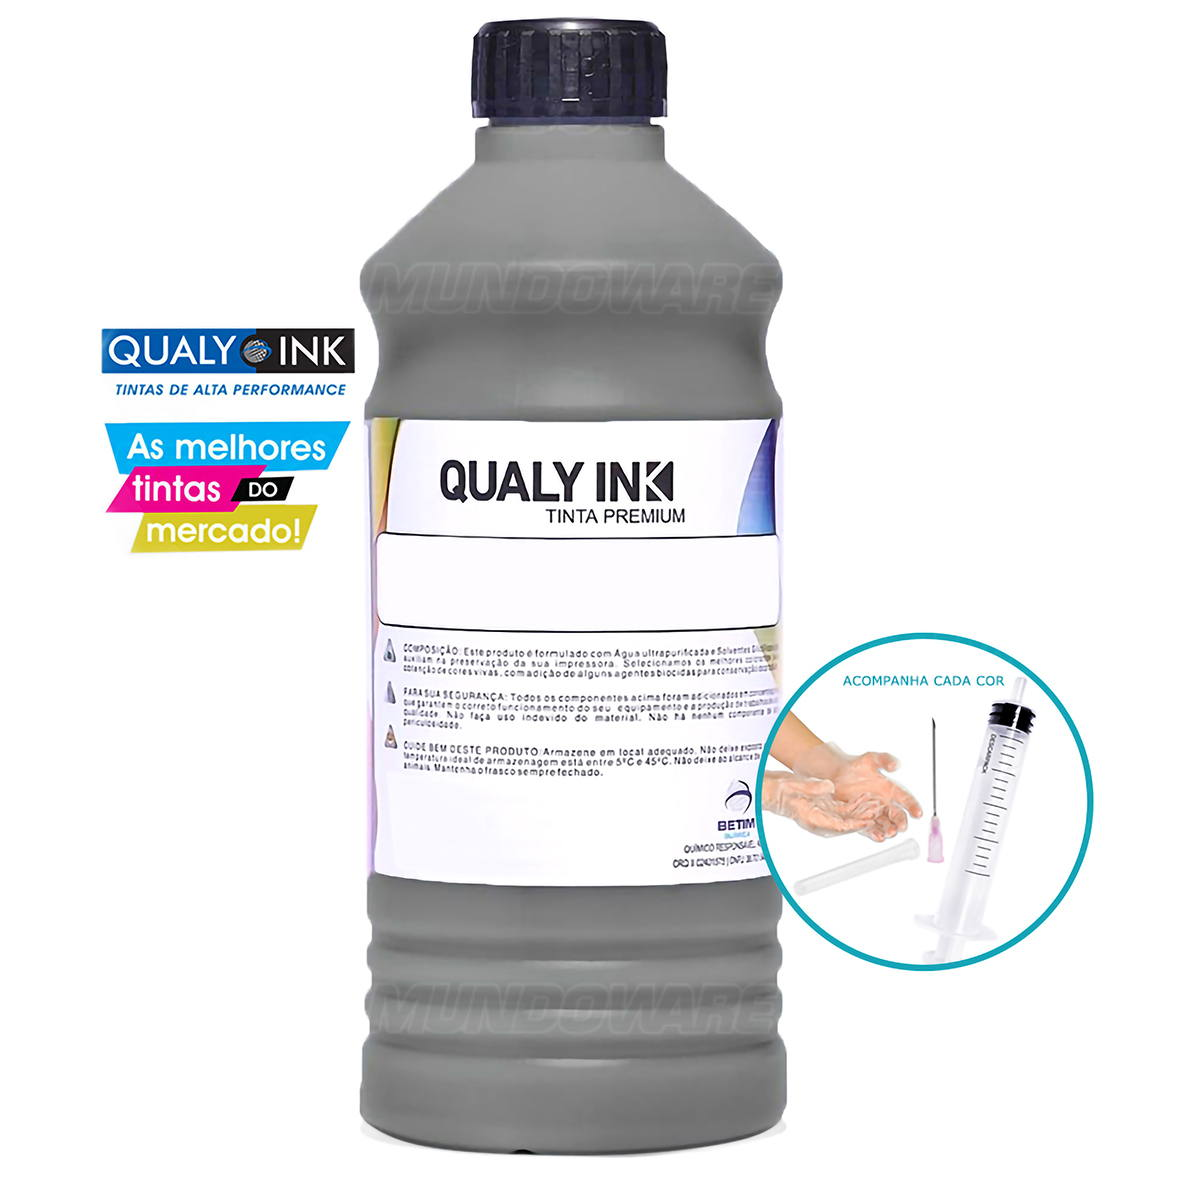 Tinta Corante Qualy-Ink Universal para Cartucho Bulk Ink e Tanque de Tinta Preto Refil 1L